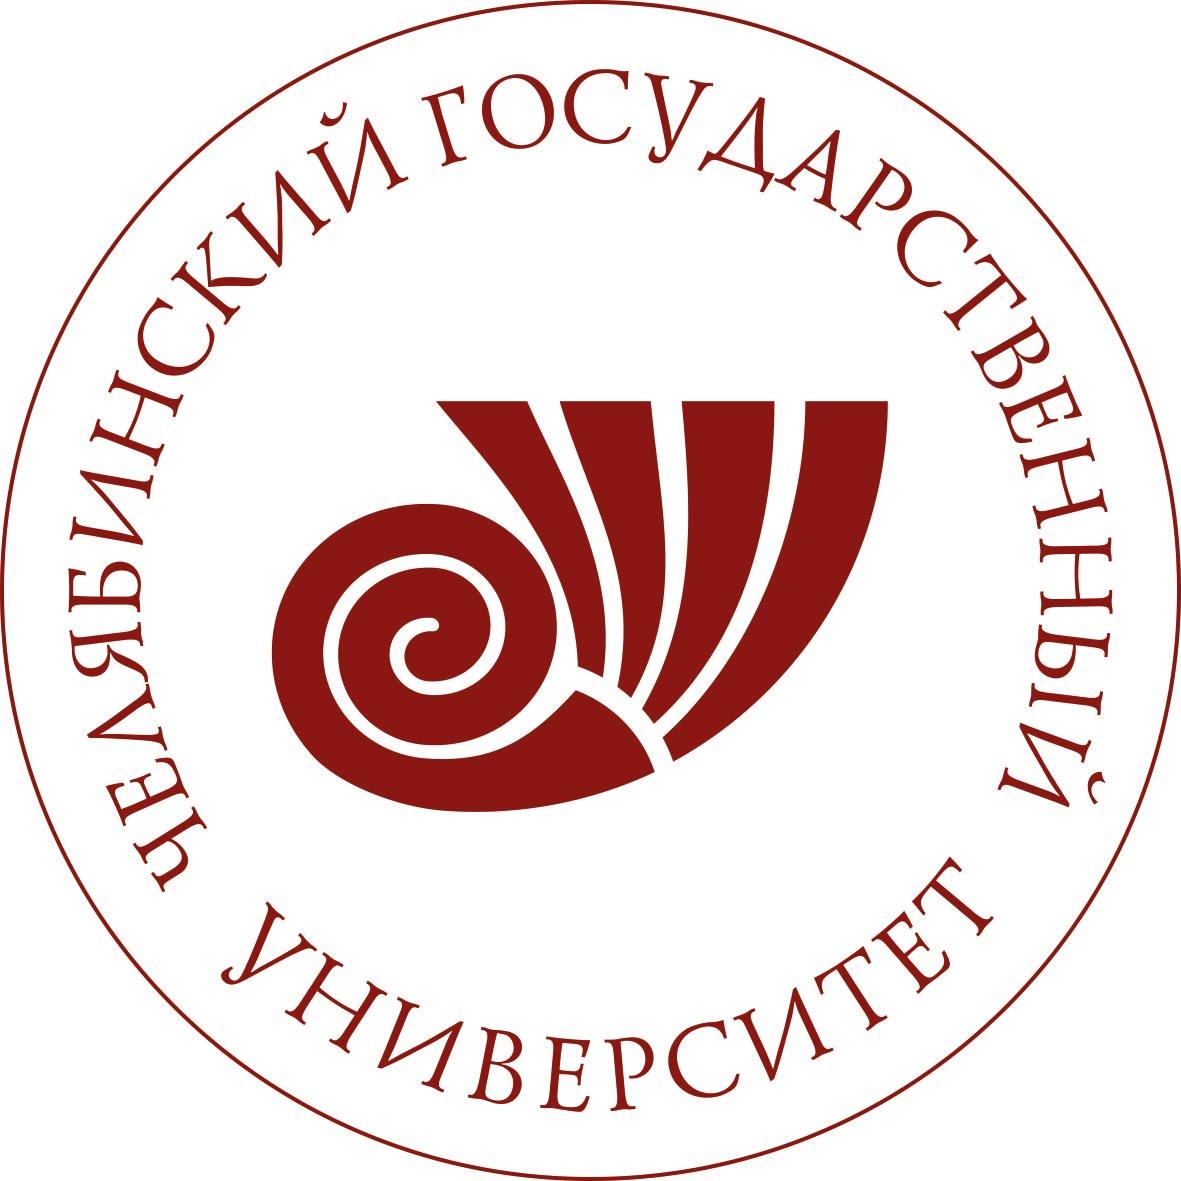 http://www.csu.ru